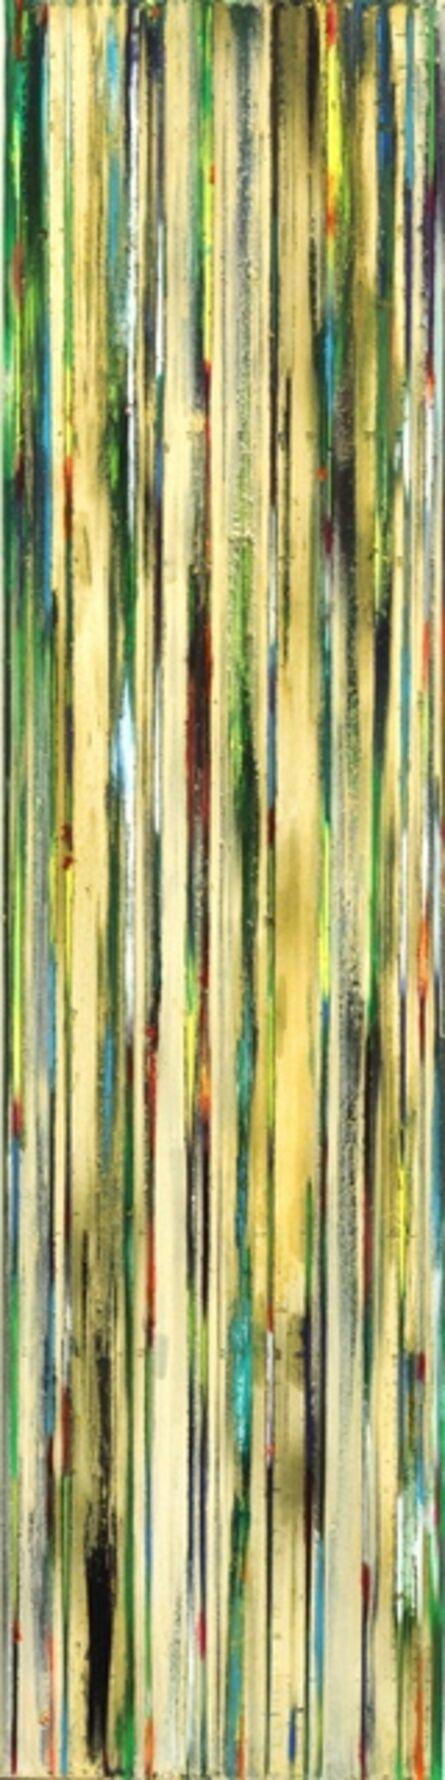 Petra Rös-Nickel, 'Green Blue Stripes', 2014